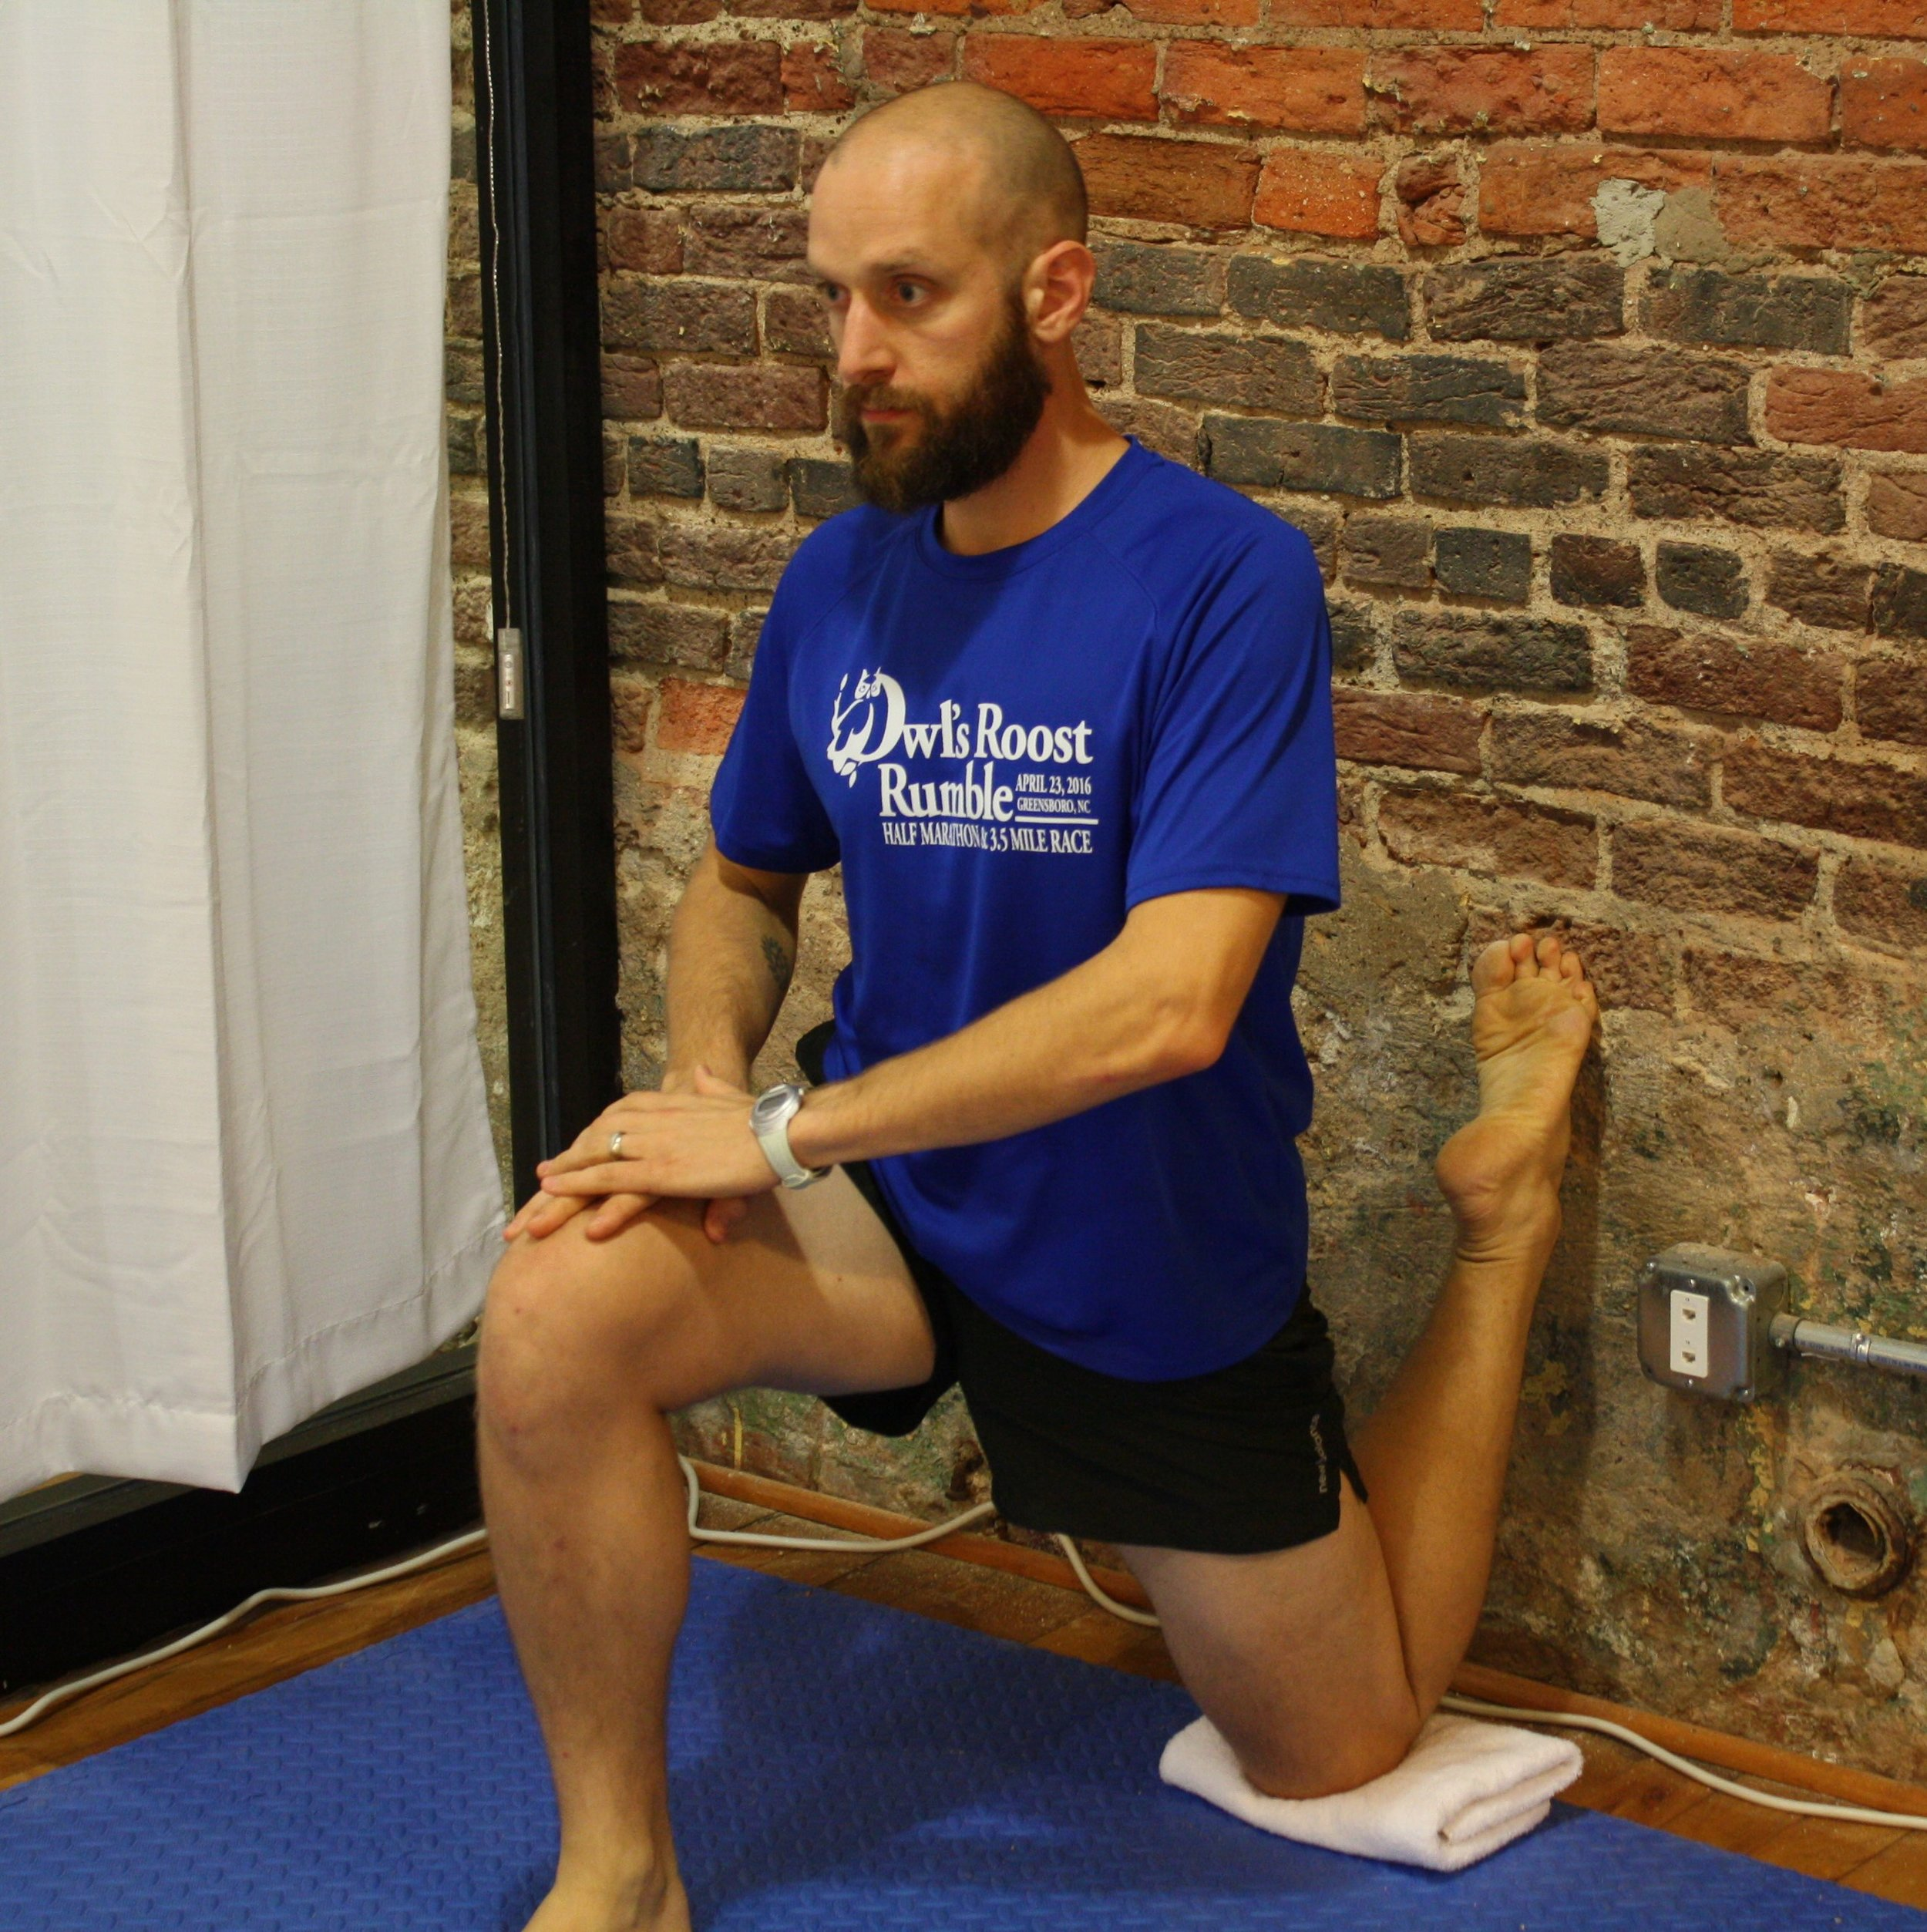 The enlightened quads stretch